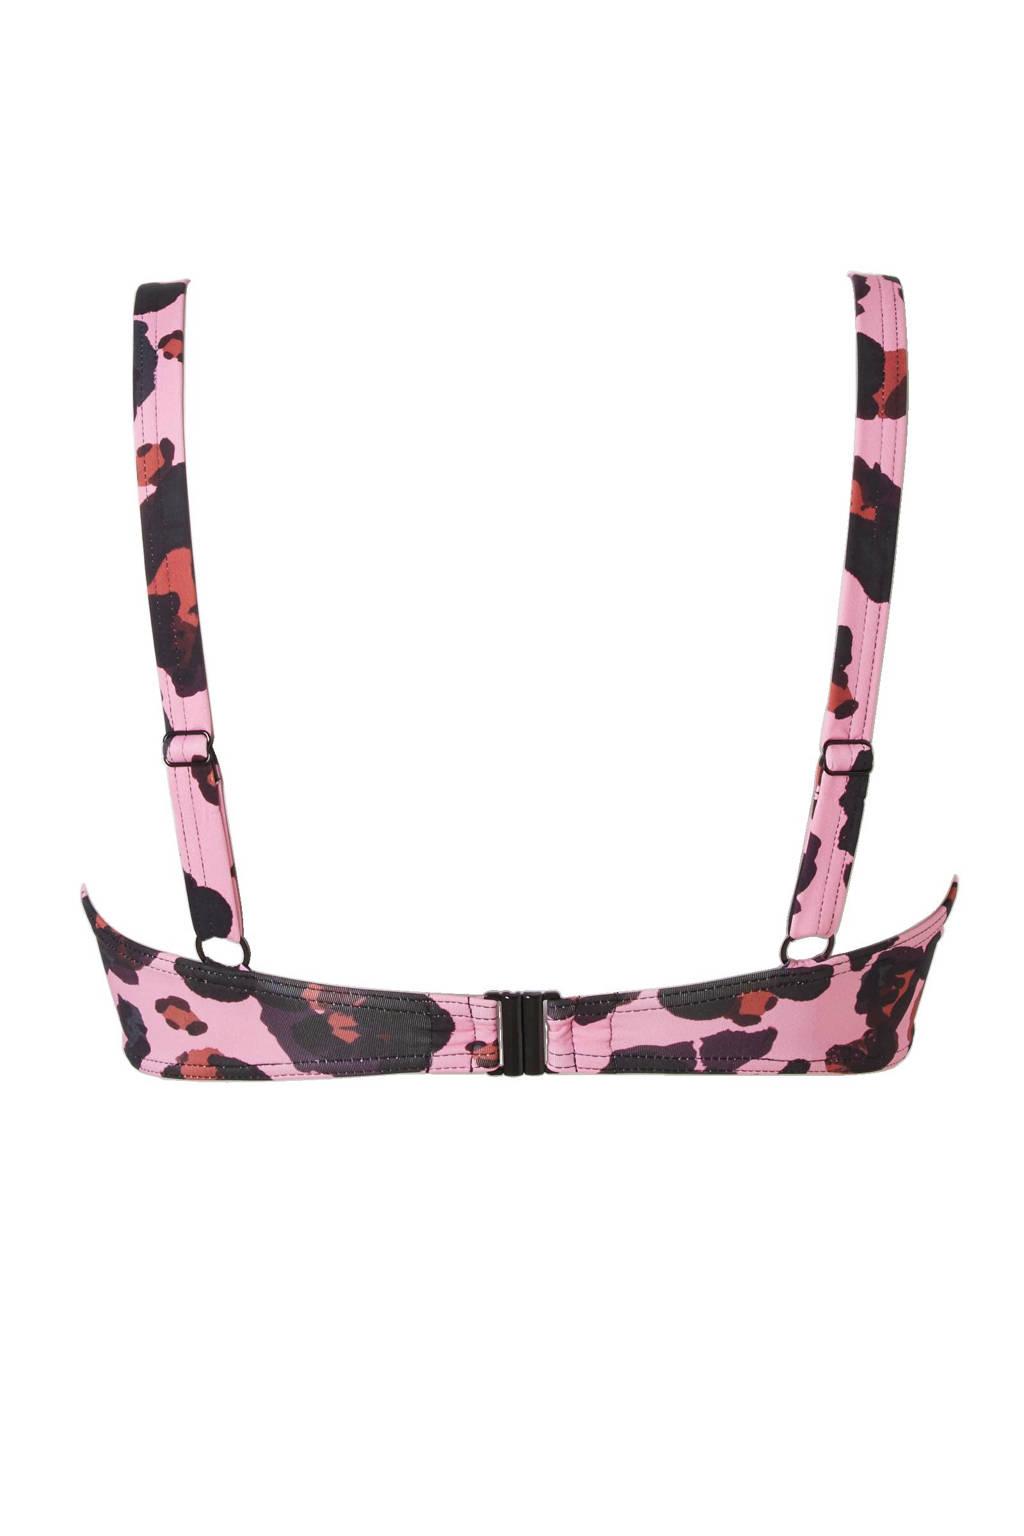 Cyell beugel bikinitop, Roze/zwart/bruin